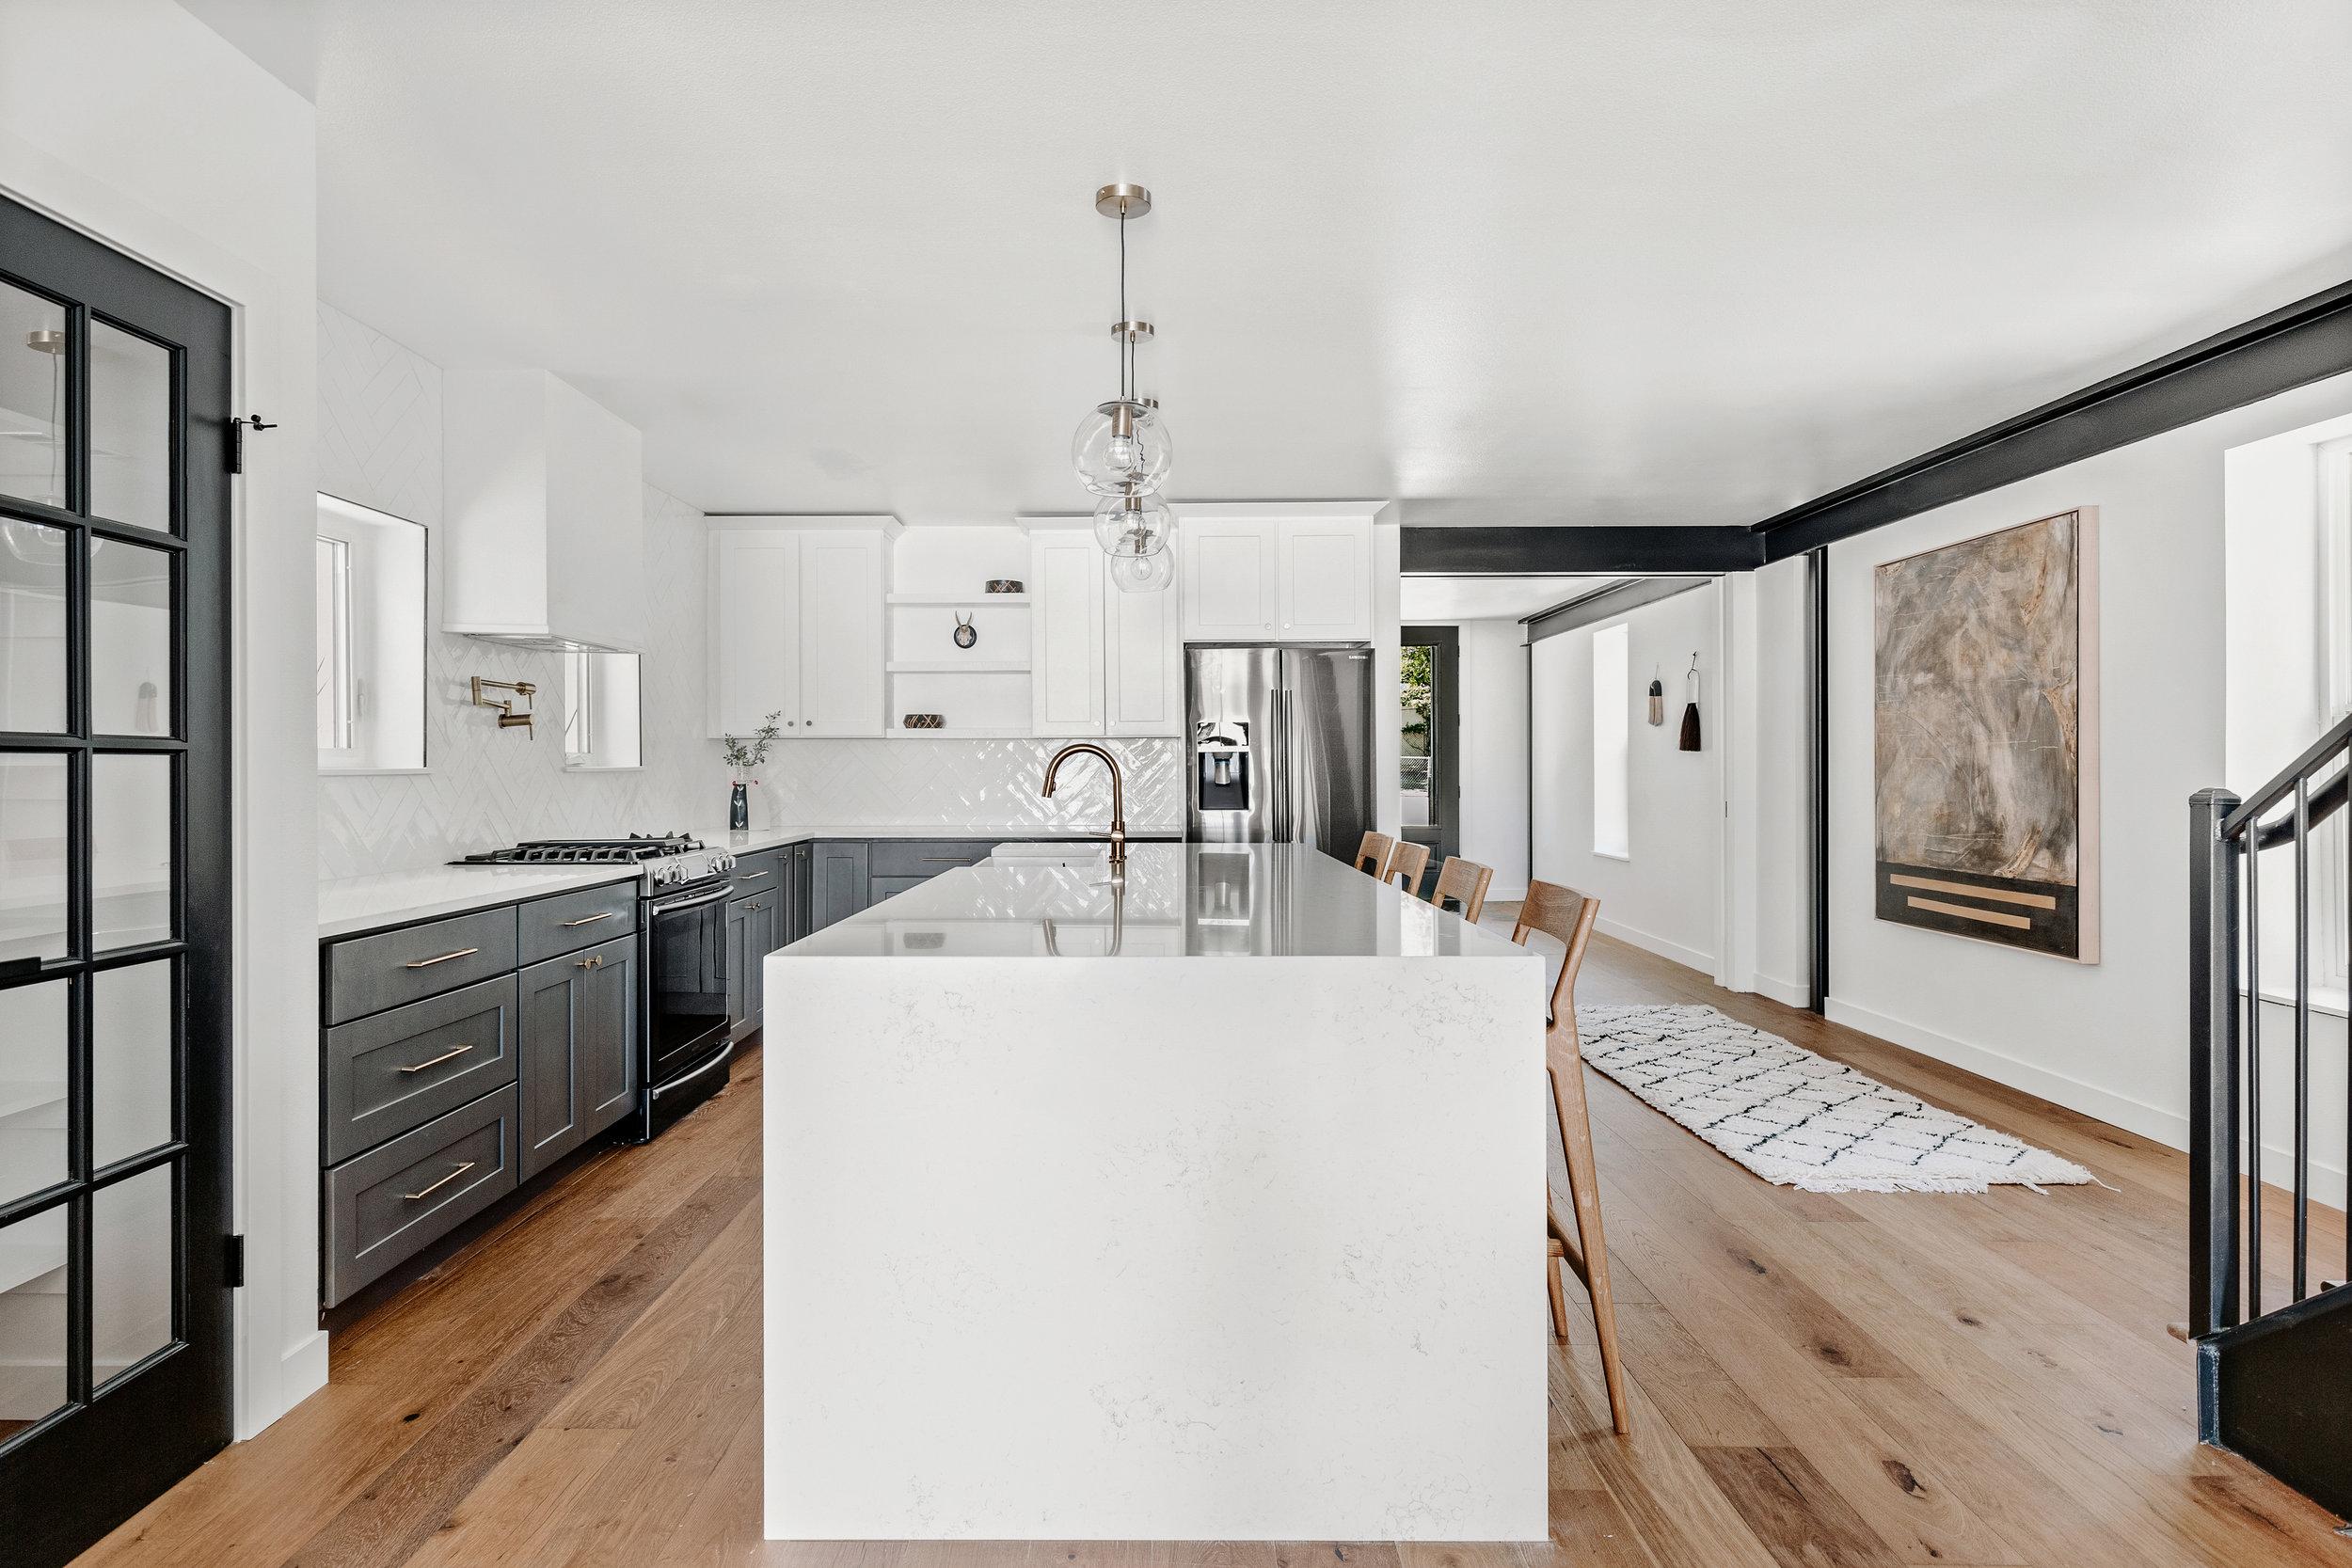 3926 Kalamath St. - Farmhouse meets luxury in Denver's Sunnyside neighborhood. Listed by Danielle Zimmerman, Fort + Hom.For sale at $1.05 million